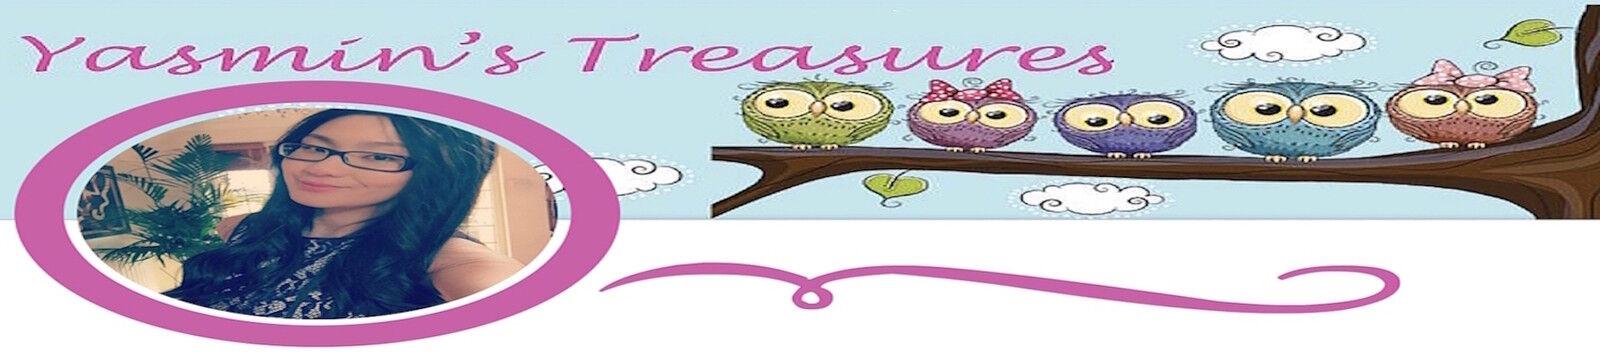 Yasmin's Treasures